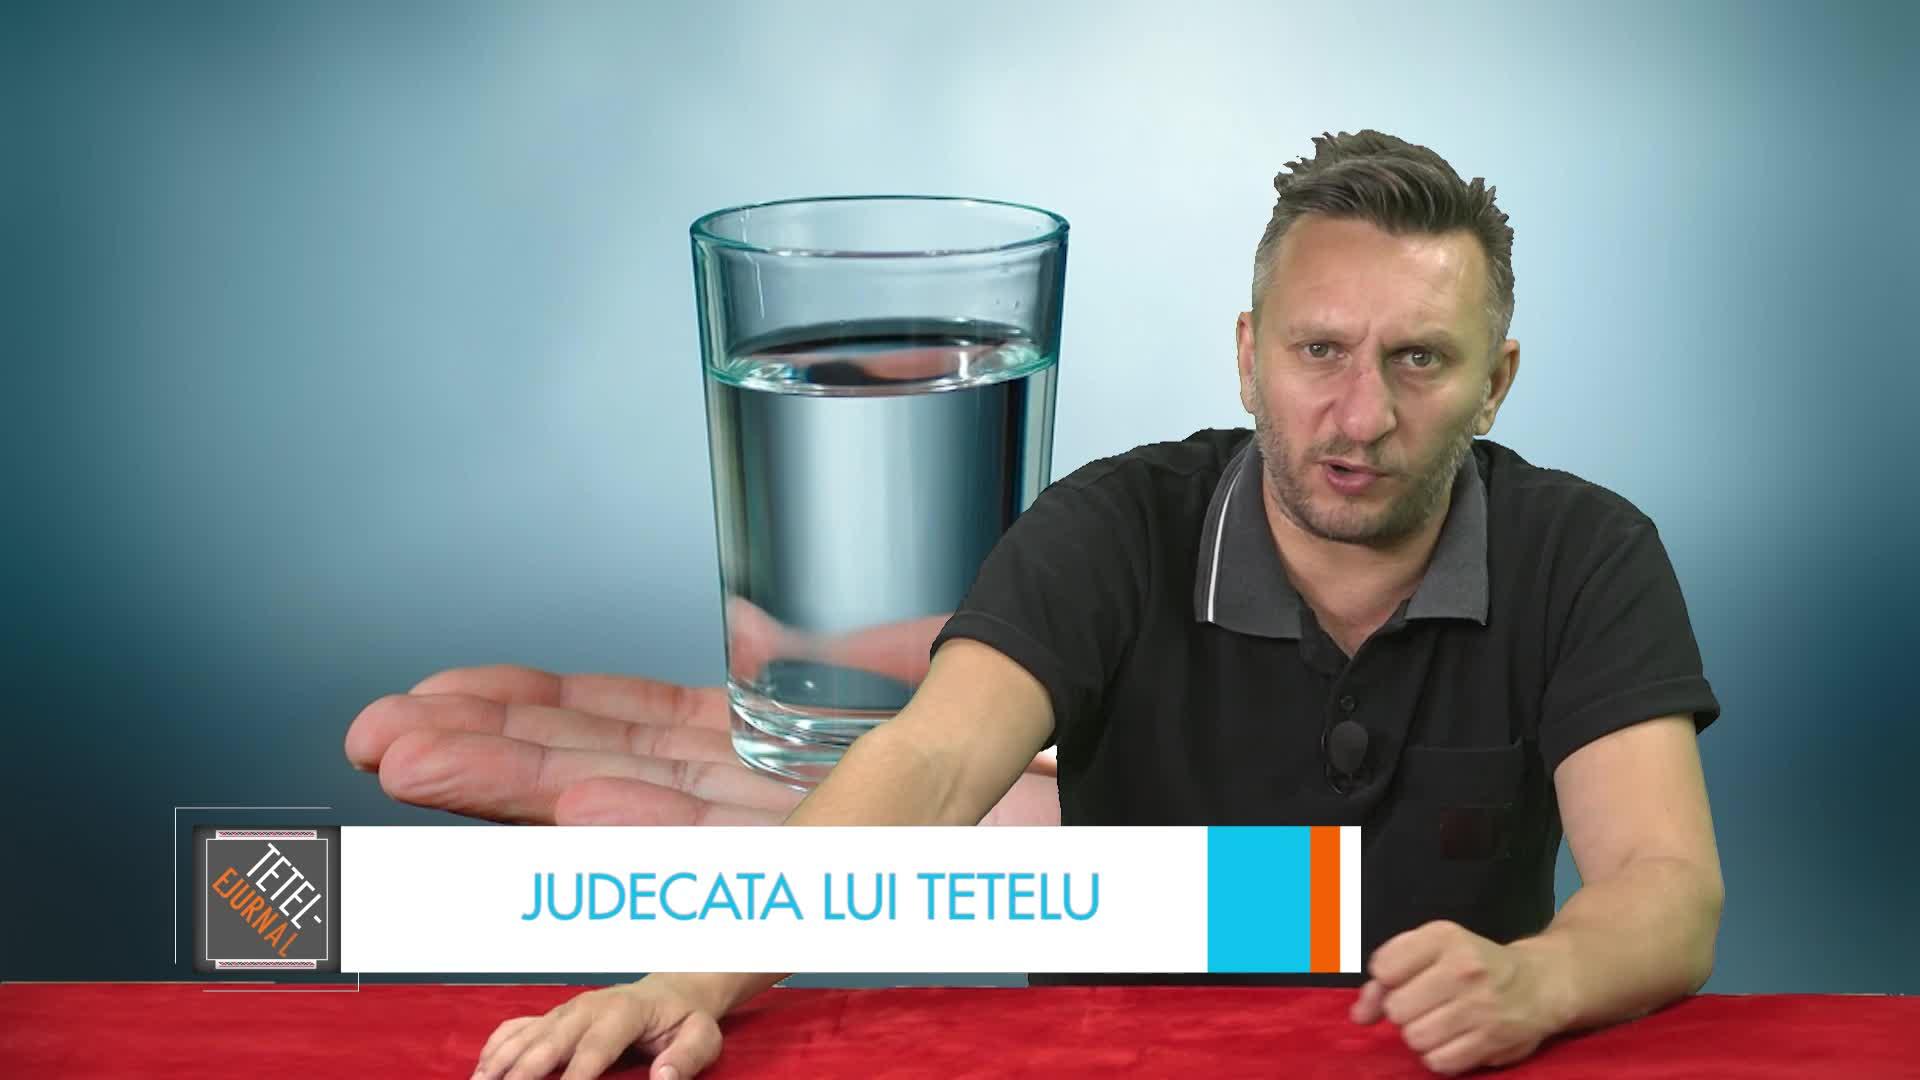 Judecata lui Tetelu: Apa maronie vs apa neagră